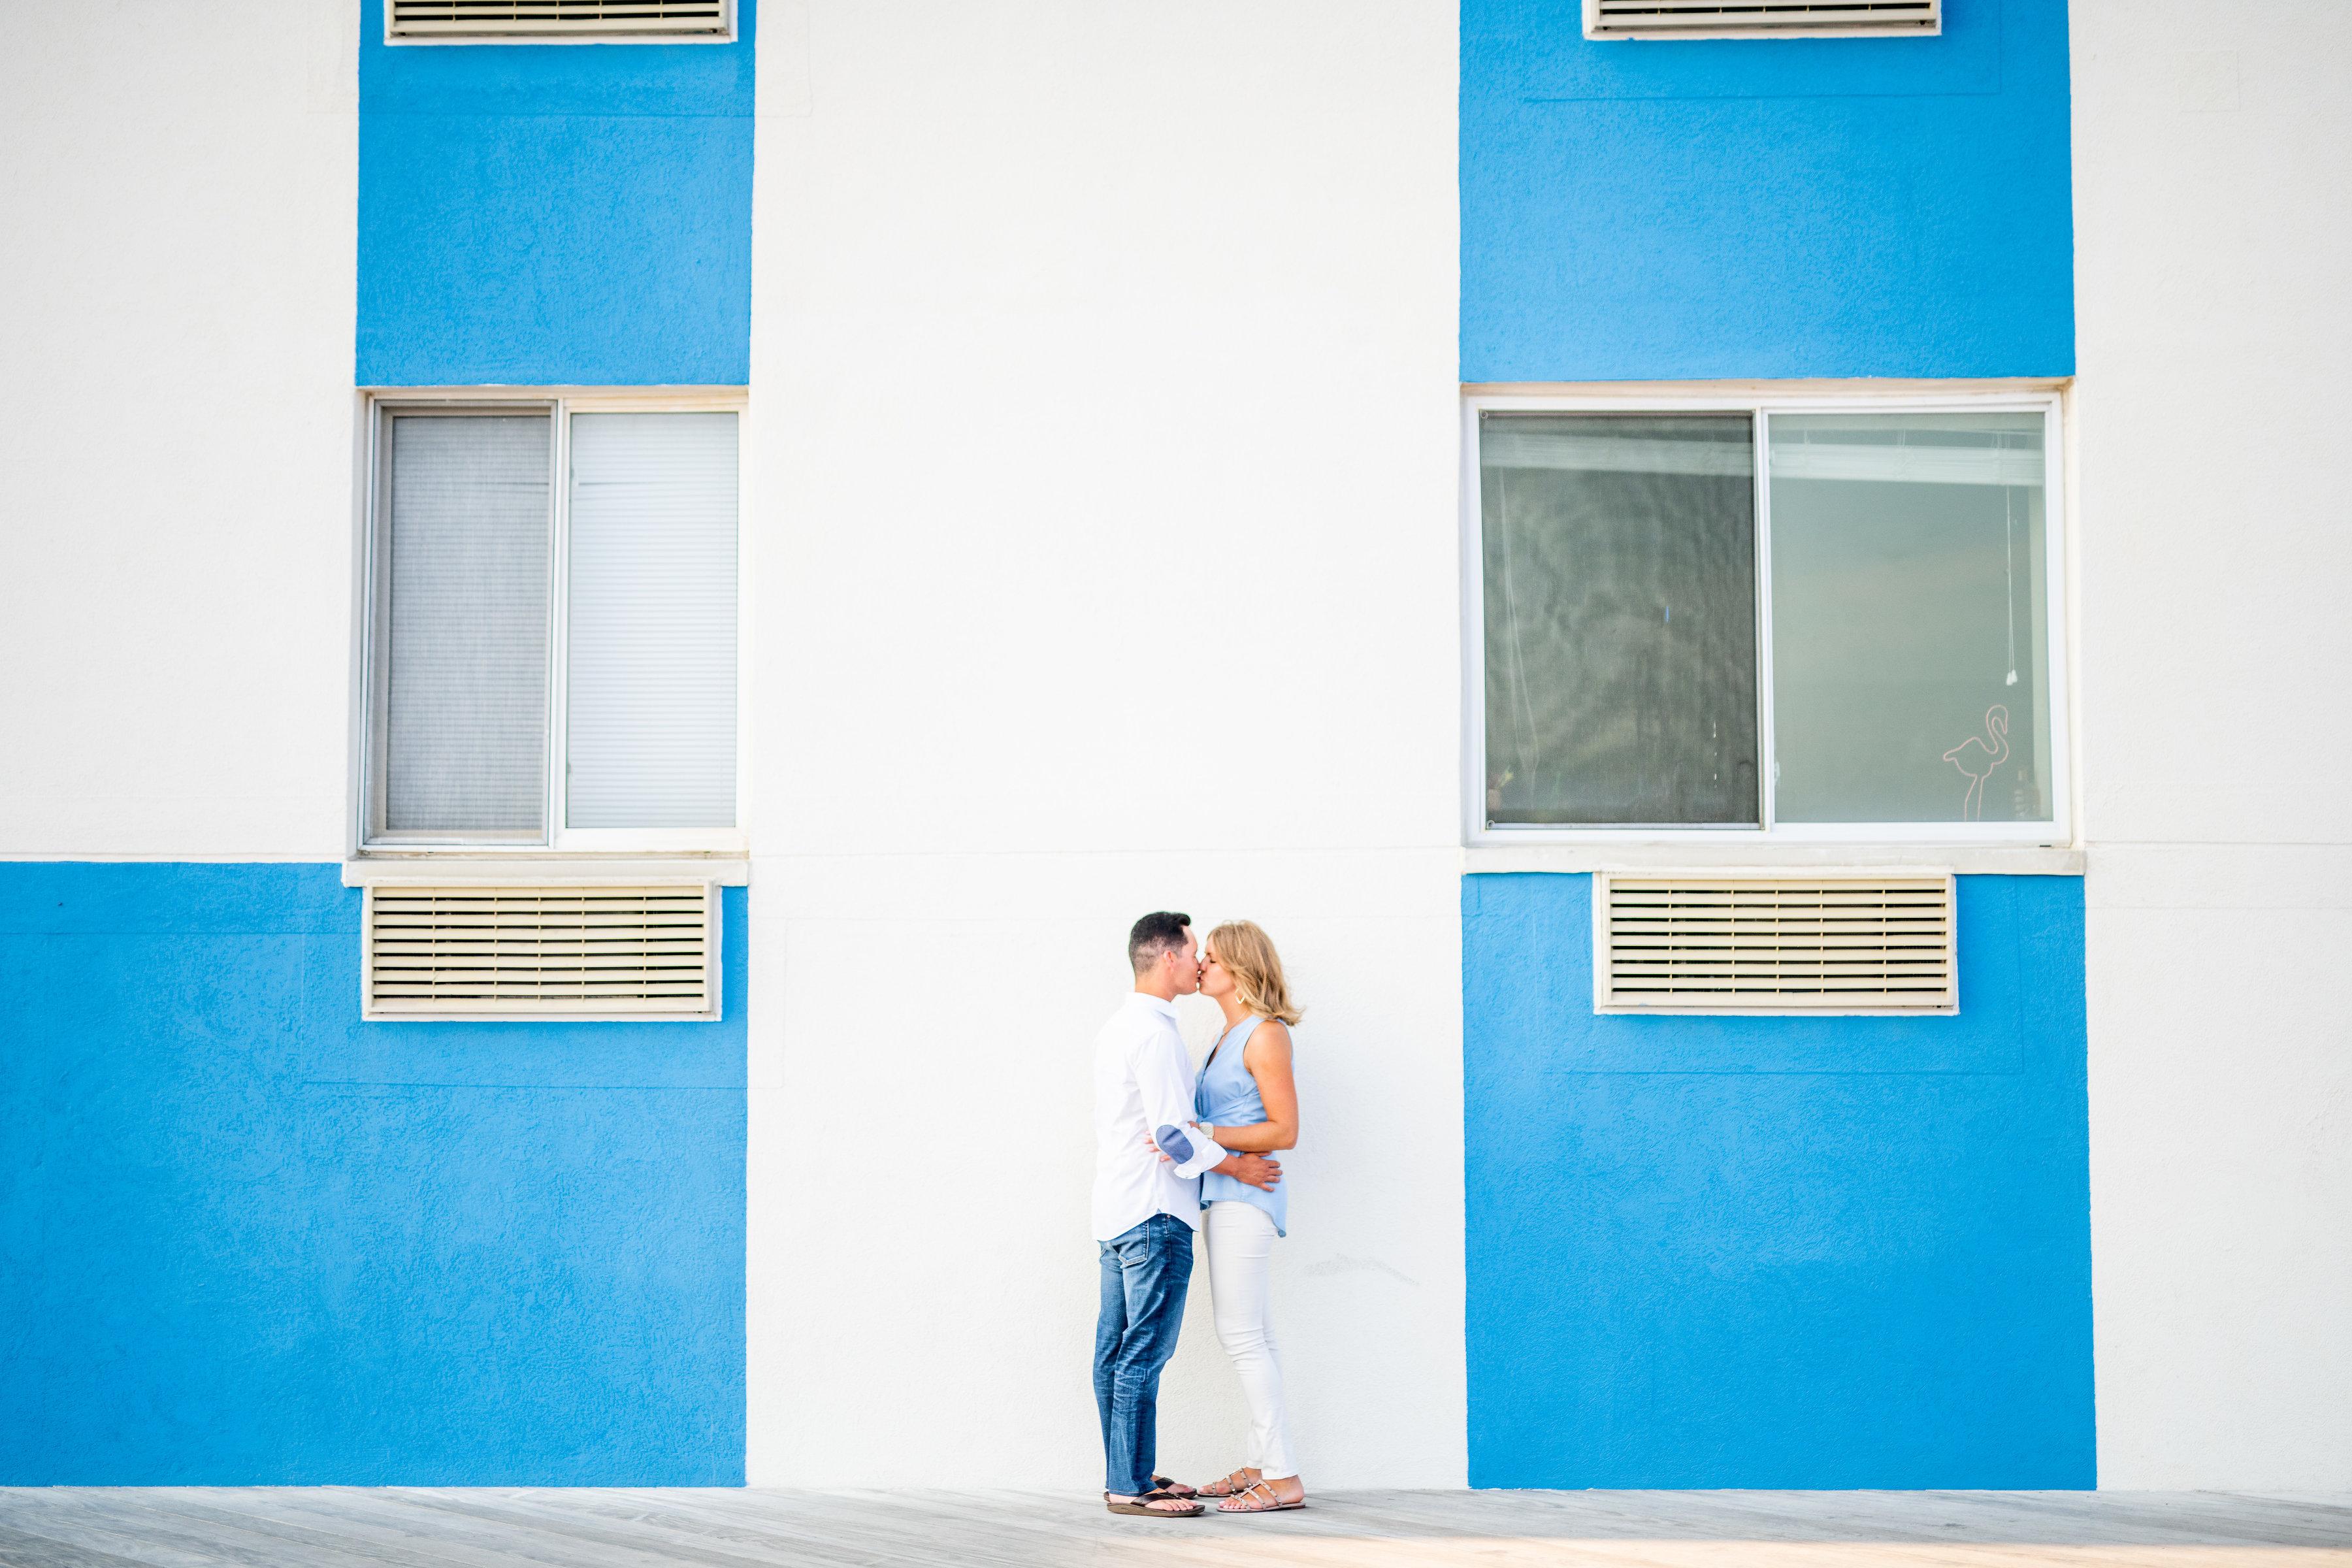 Long Beach NY Engagement Shoot | Long Beach Boardwalk Engagement Shoot | Long Island Wedding Photographer 17